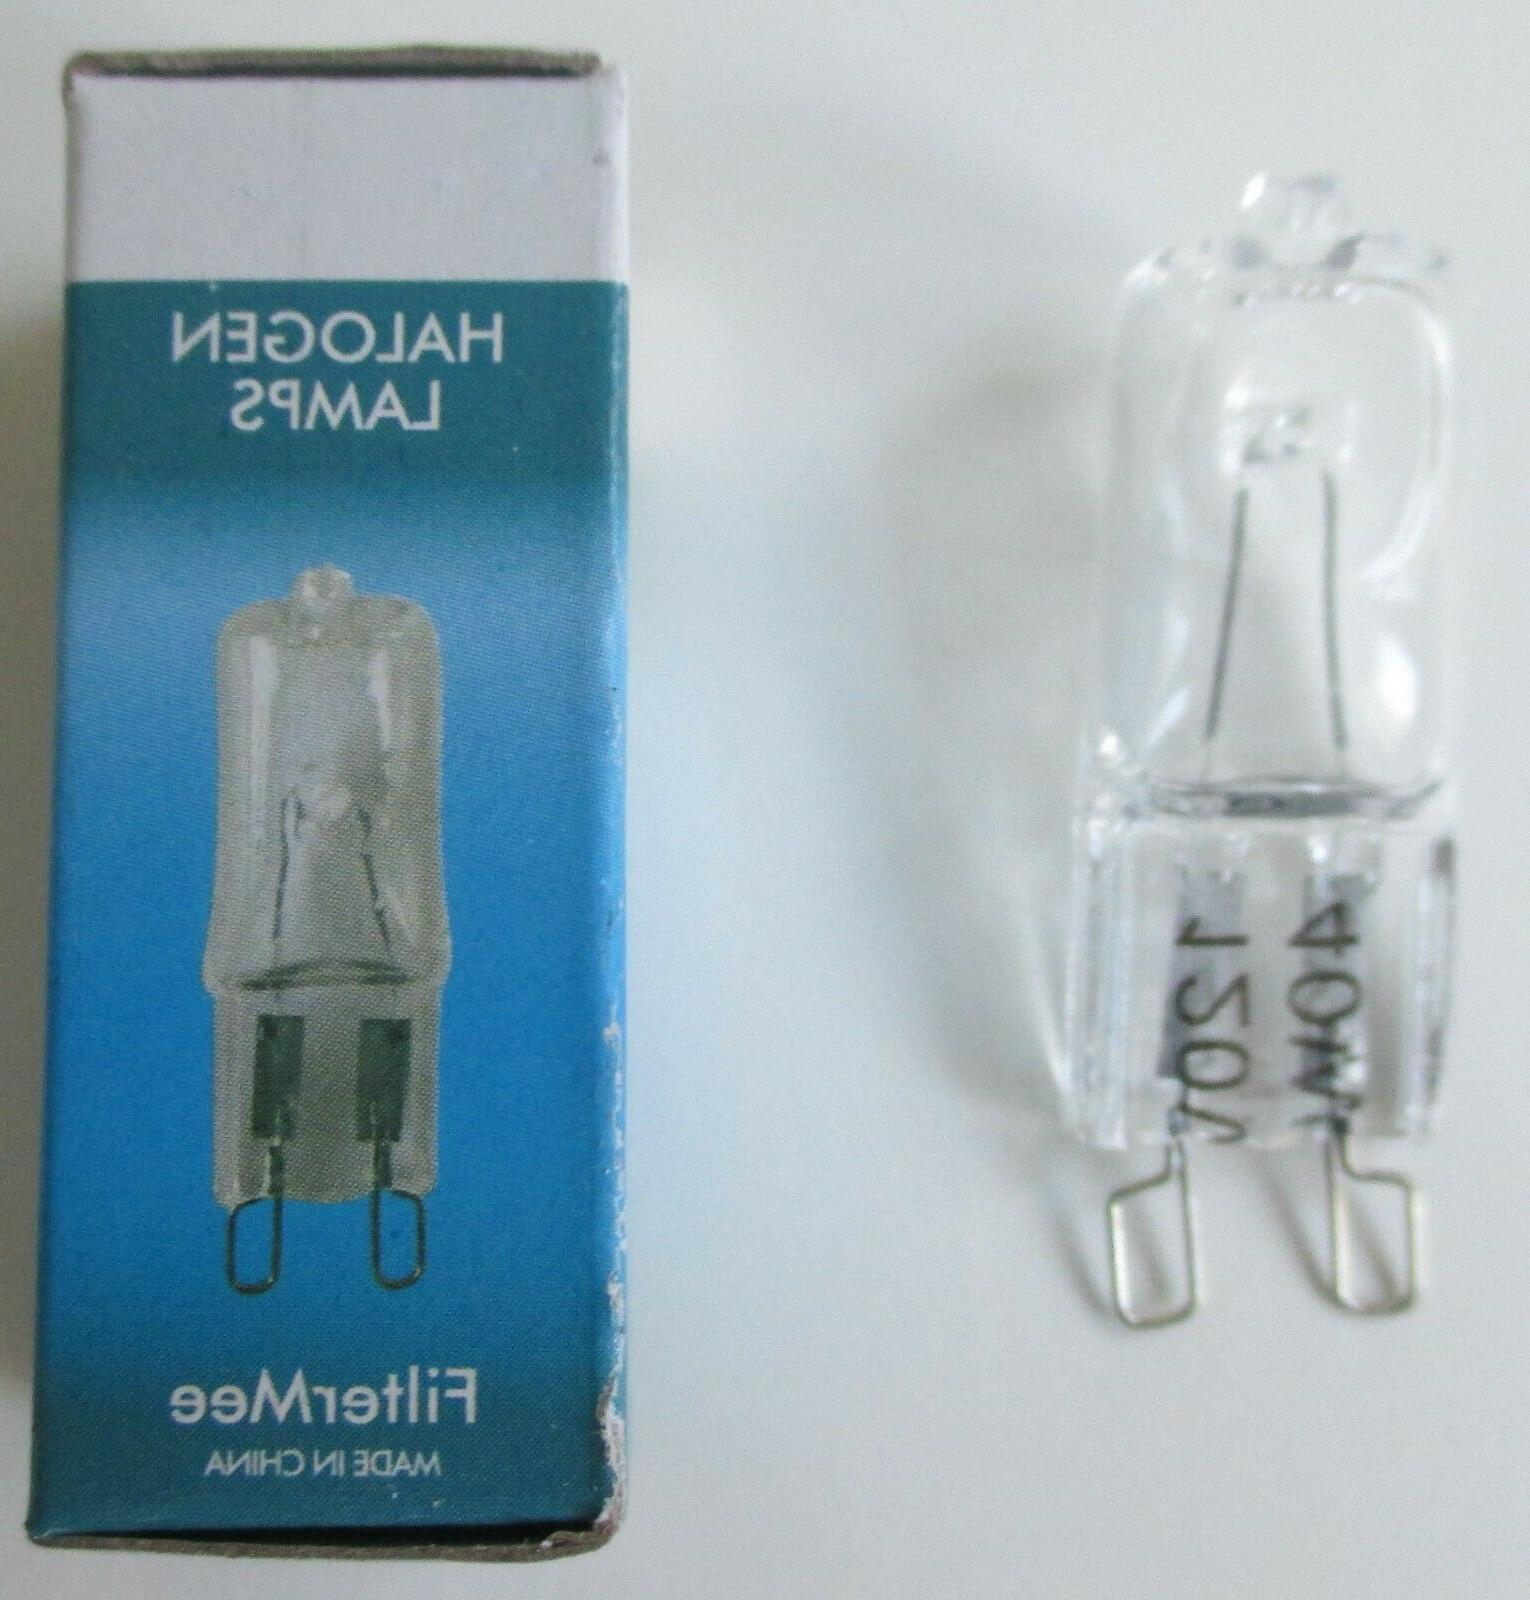 2 halogen light bulbs g9 120v 40w